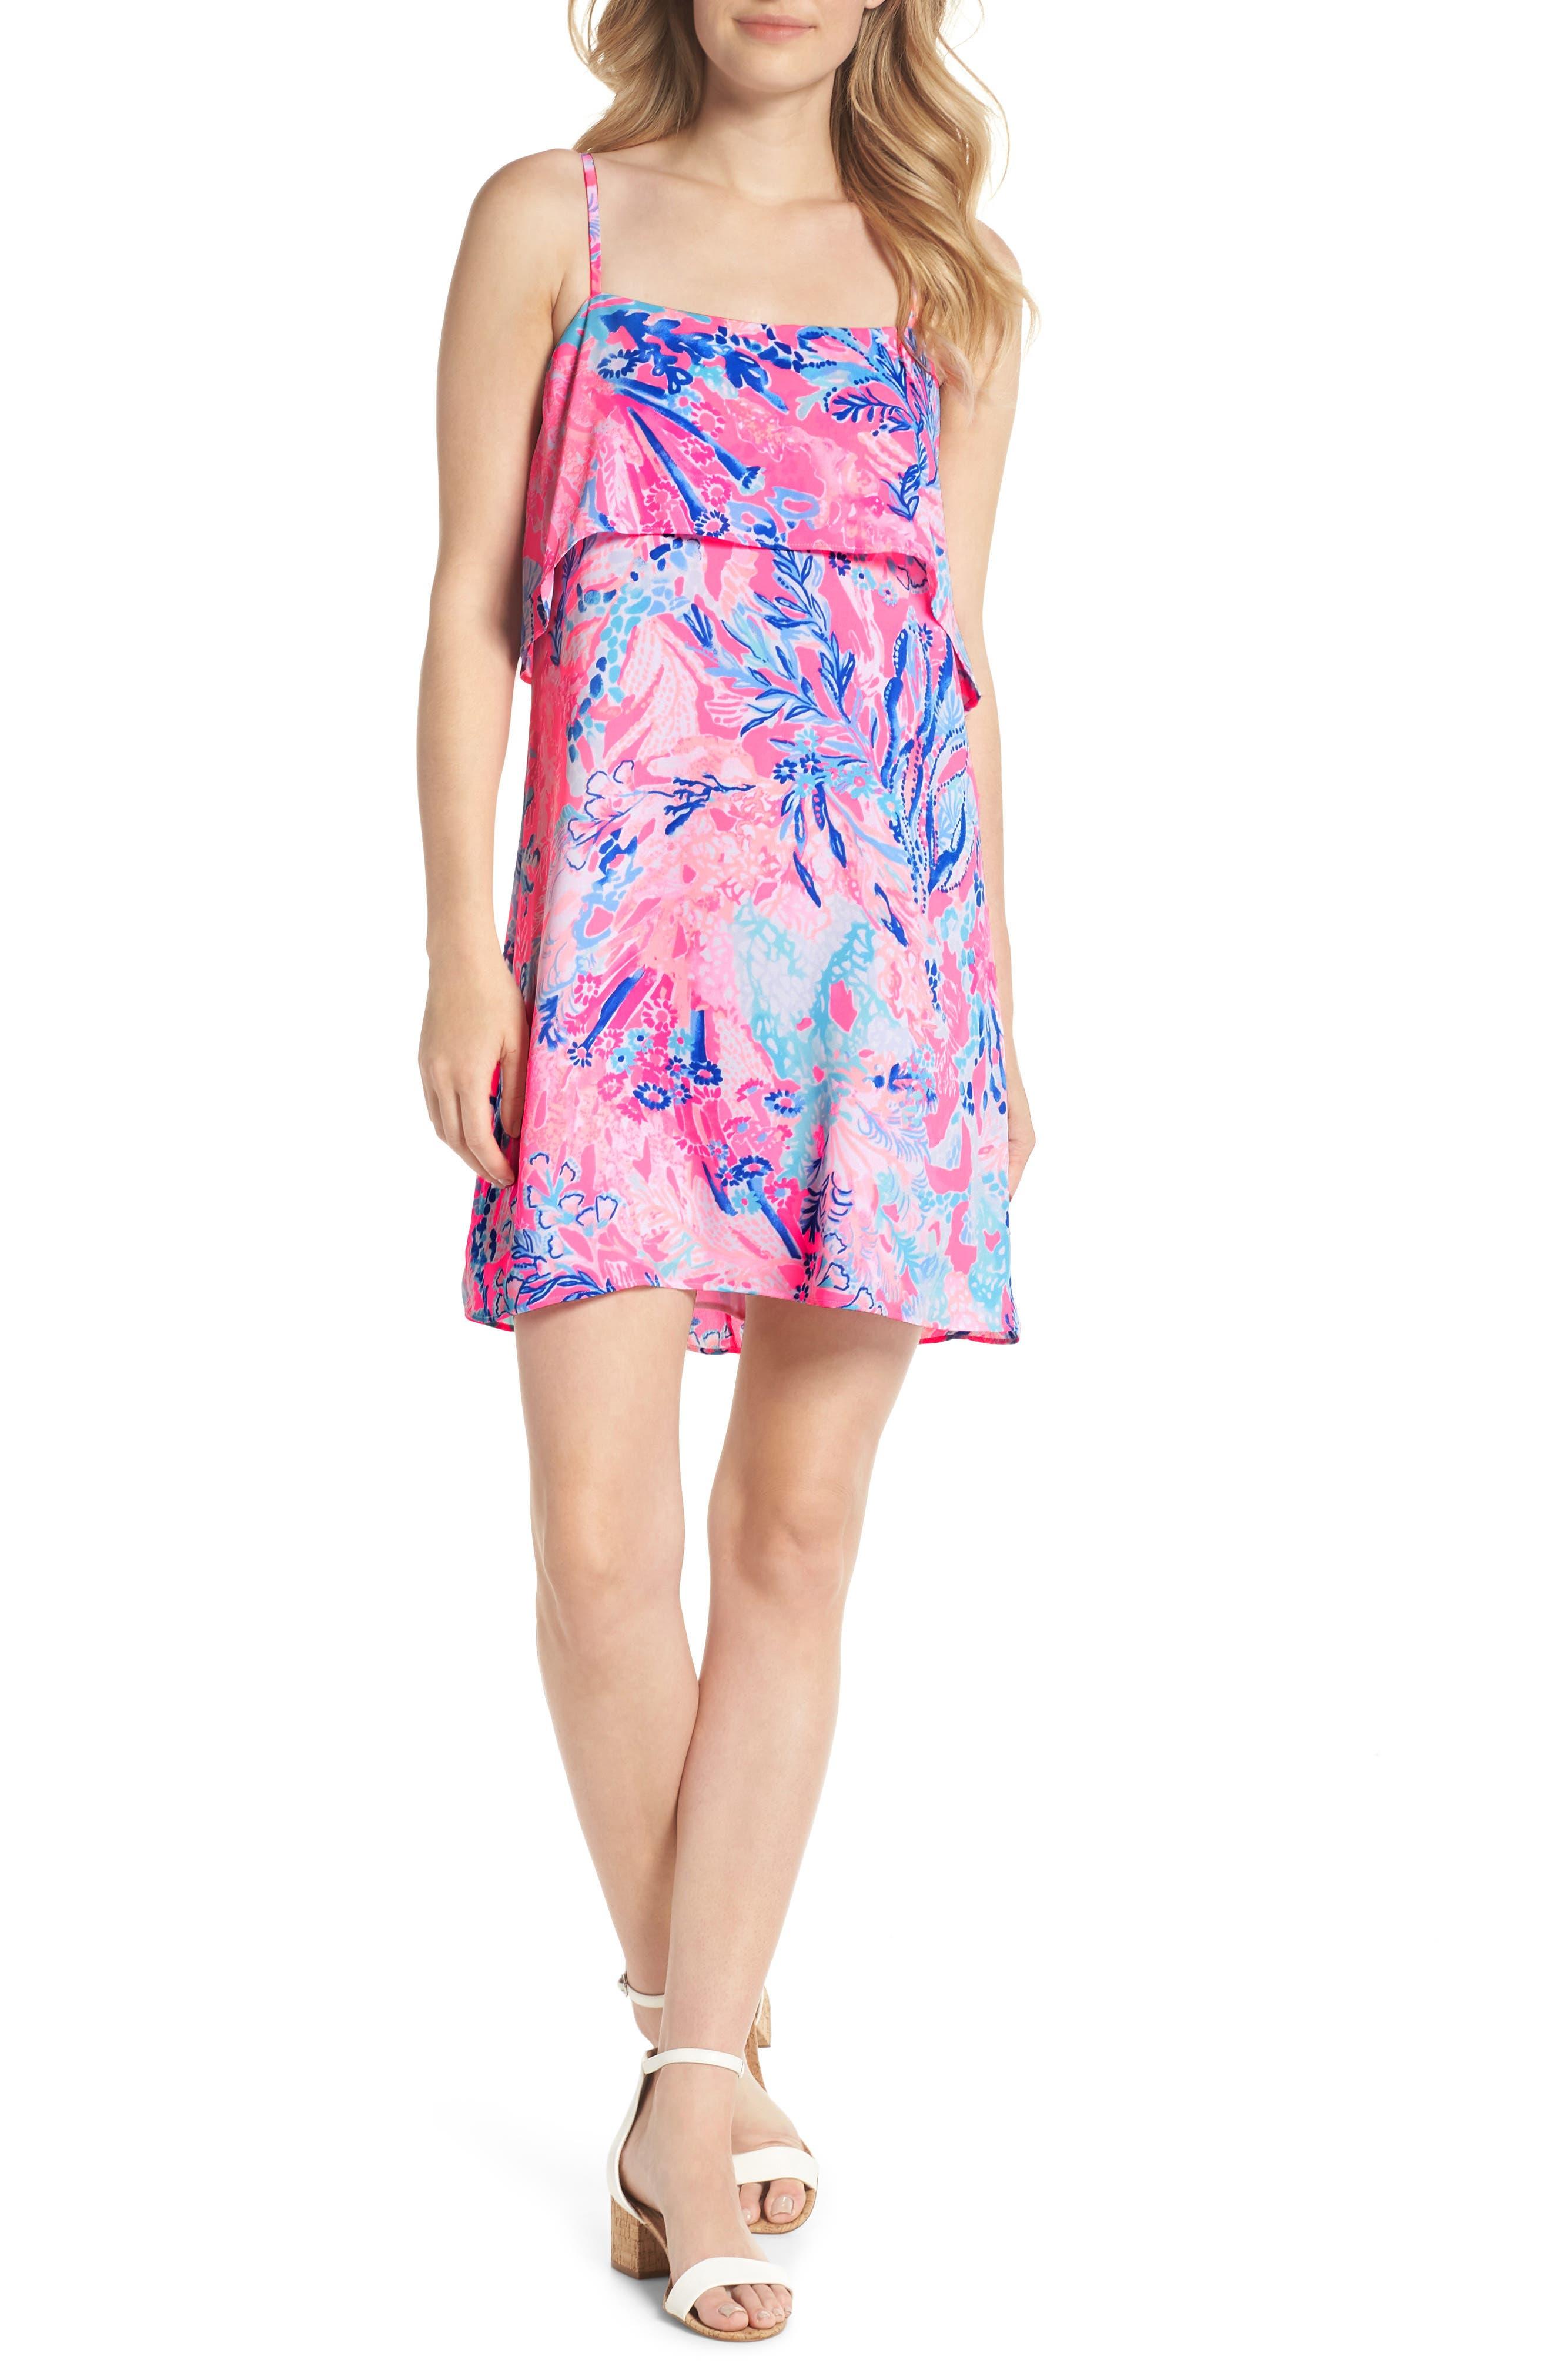 Lexi Shift Dress,                             Main thumbnail 1, color,                             Light Pascha Pink Aquadesiac